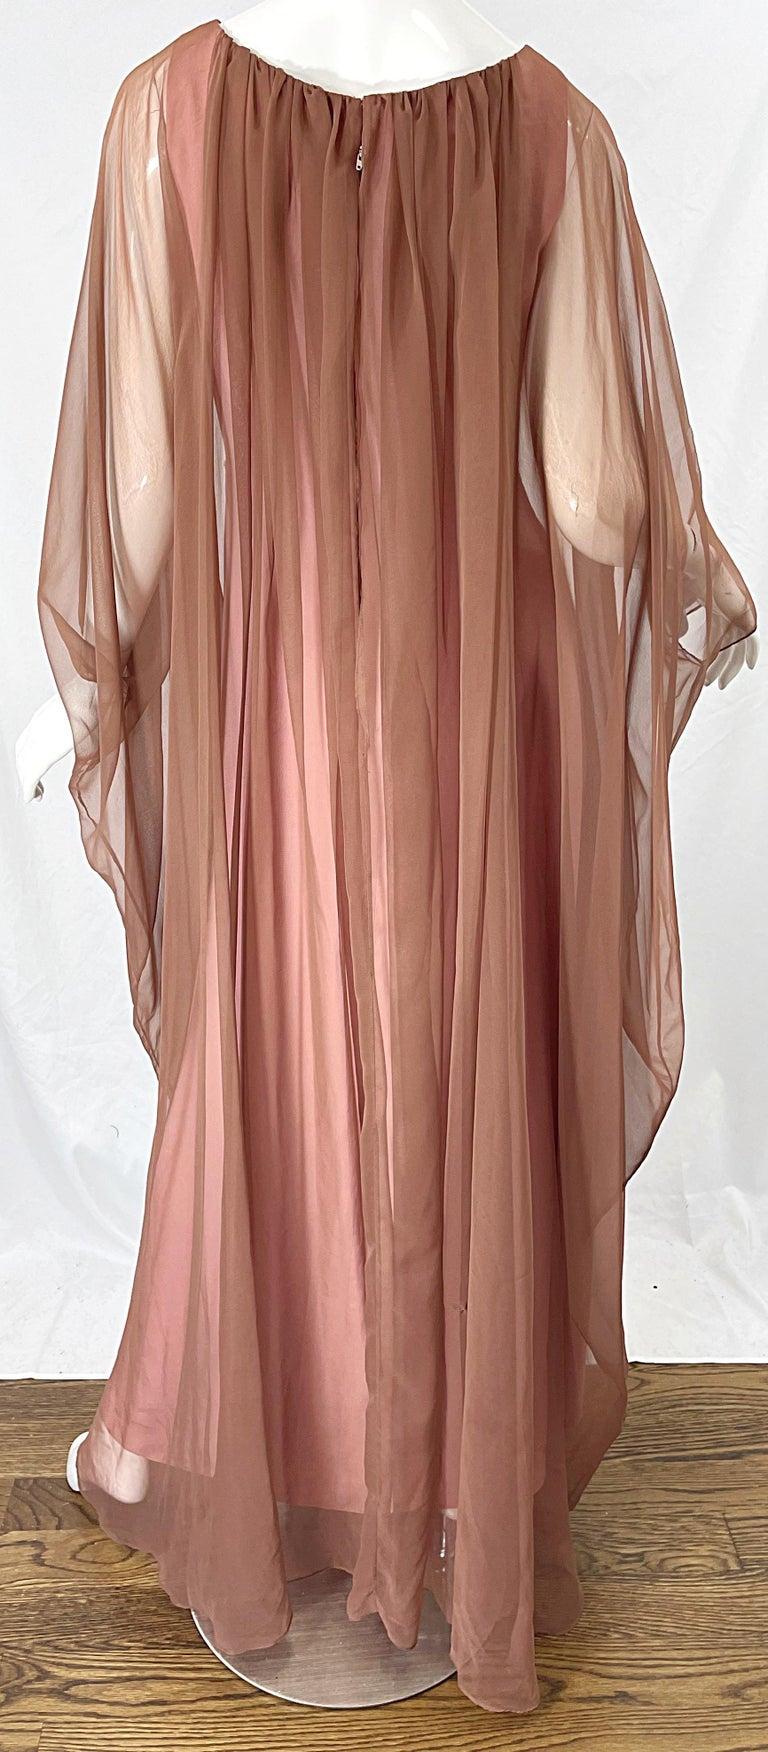 1970s Estevez Pink + Nude Brown Chiffon Caftan Vintage 70s Kaftan Maxi Dress For Sale 2